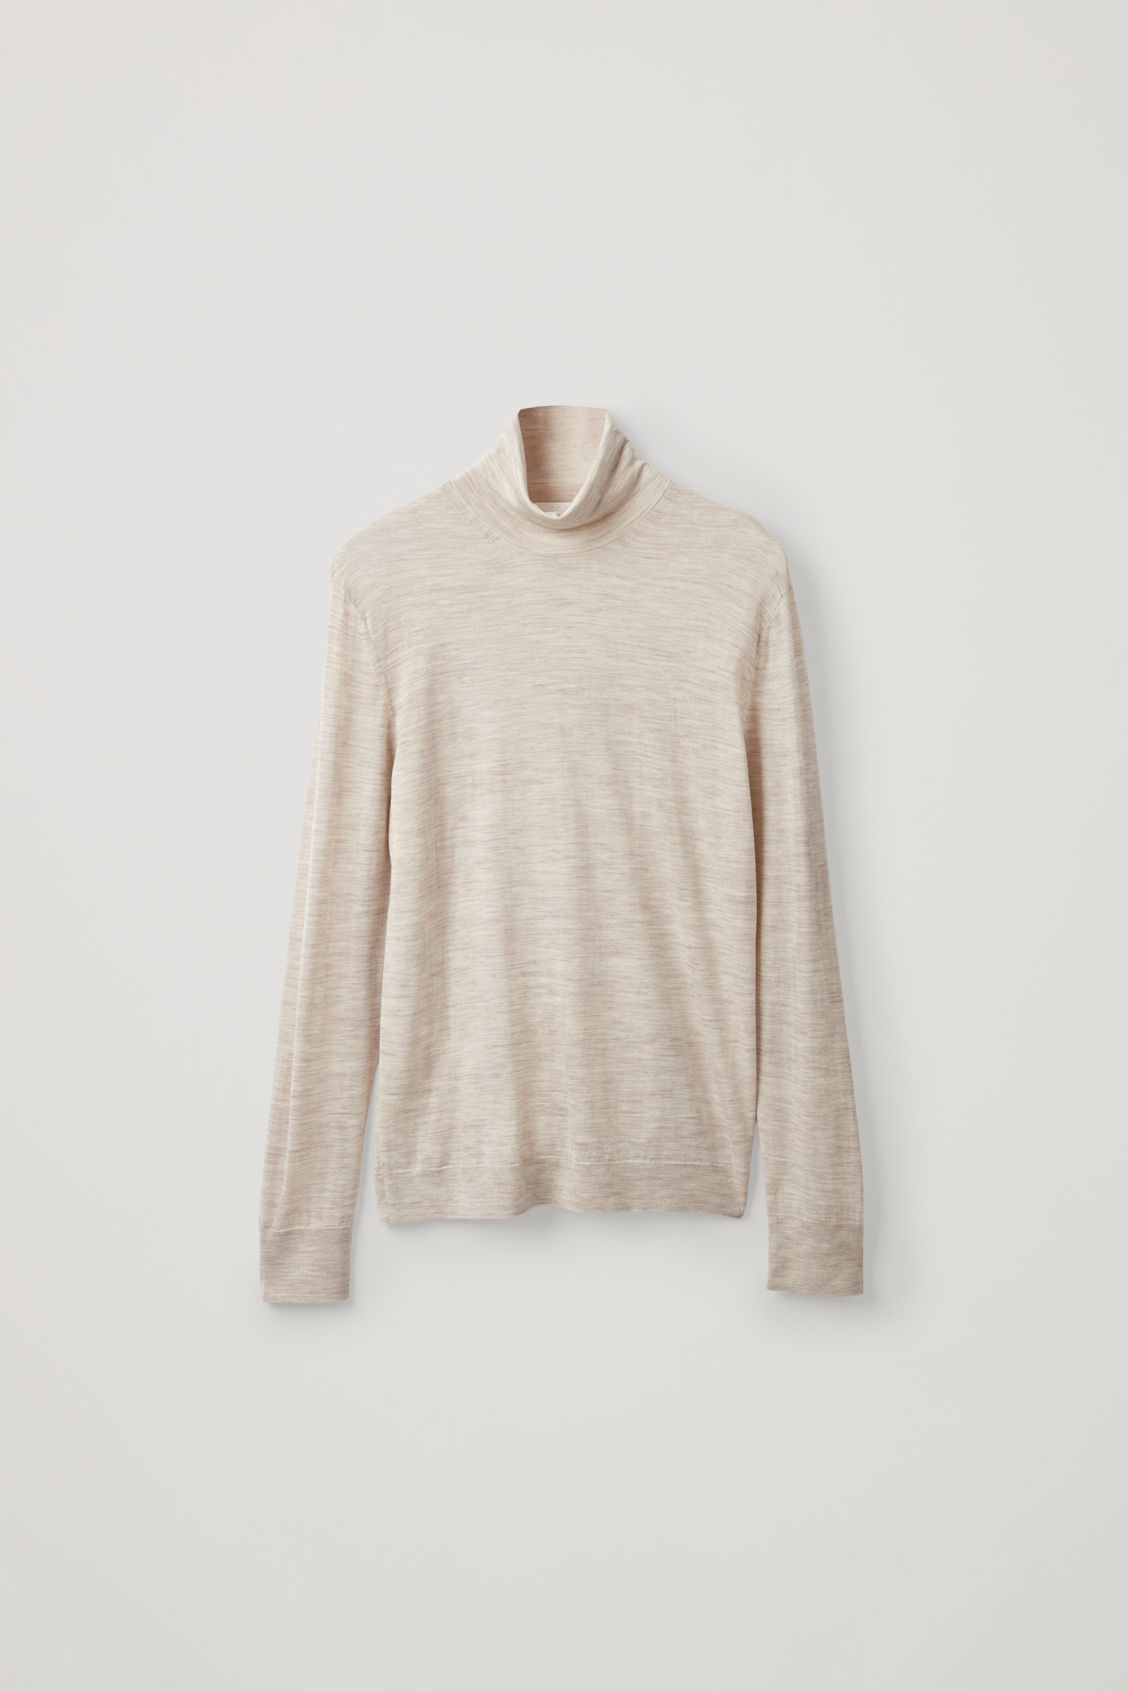 Cos Merino Roll-Neck Sweater In Beige